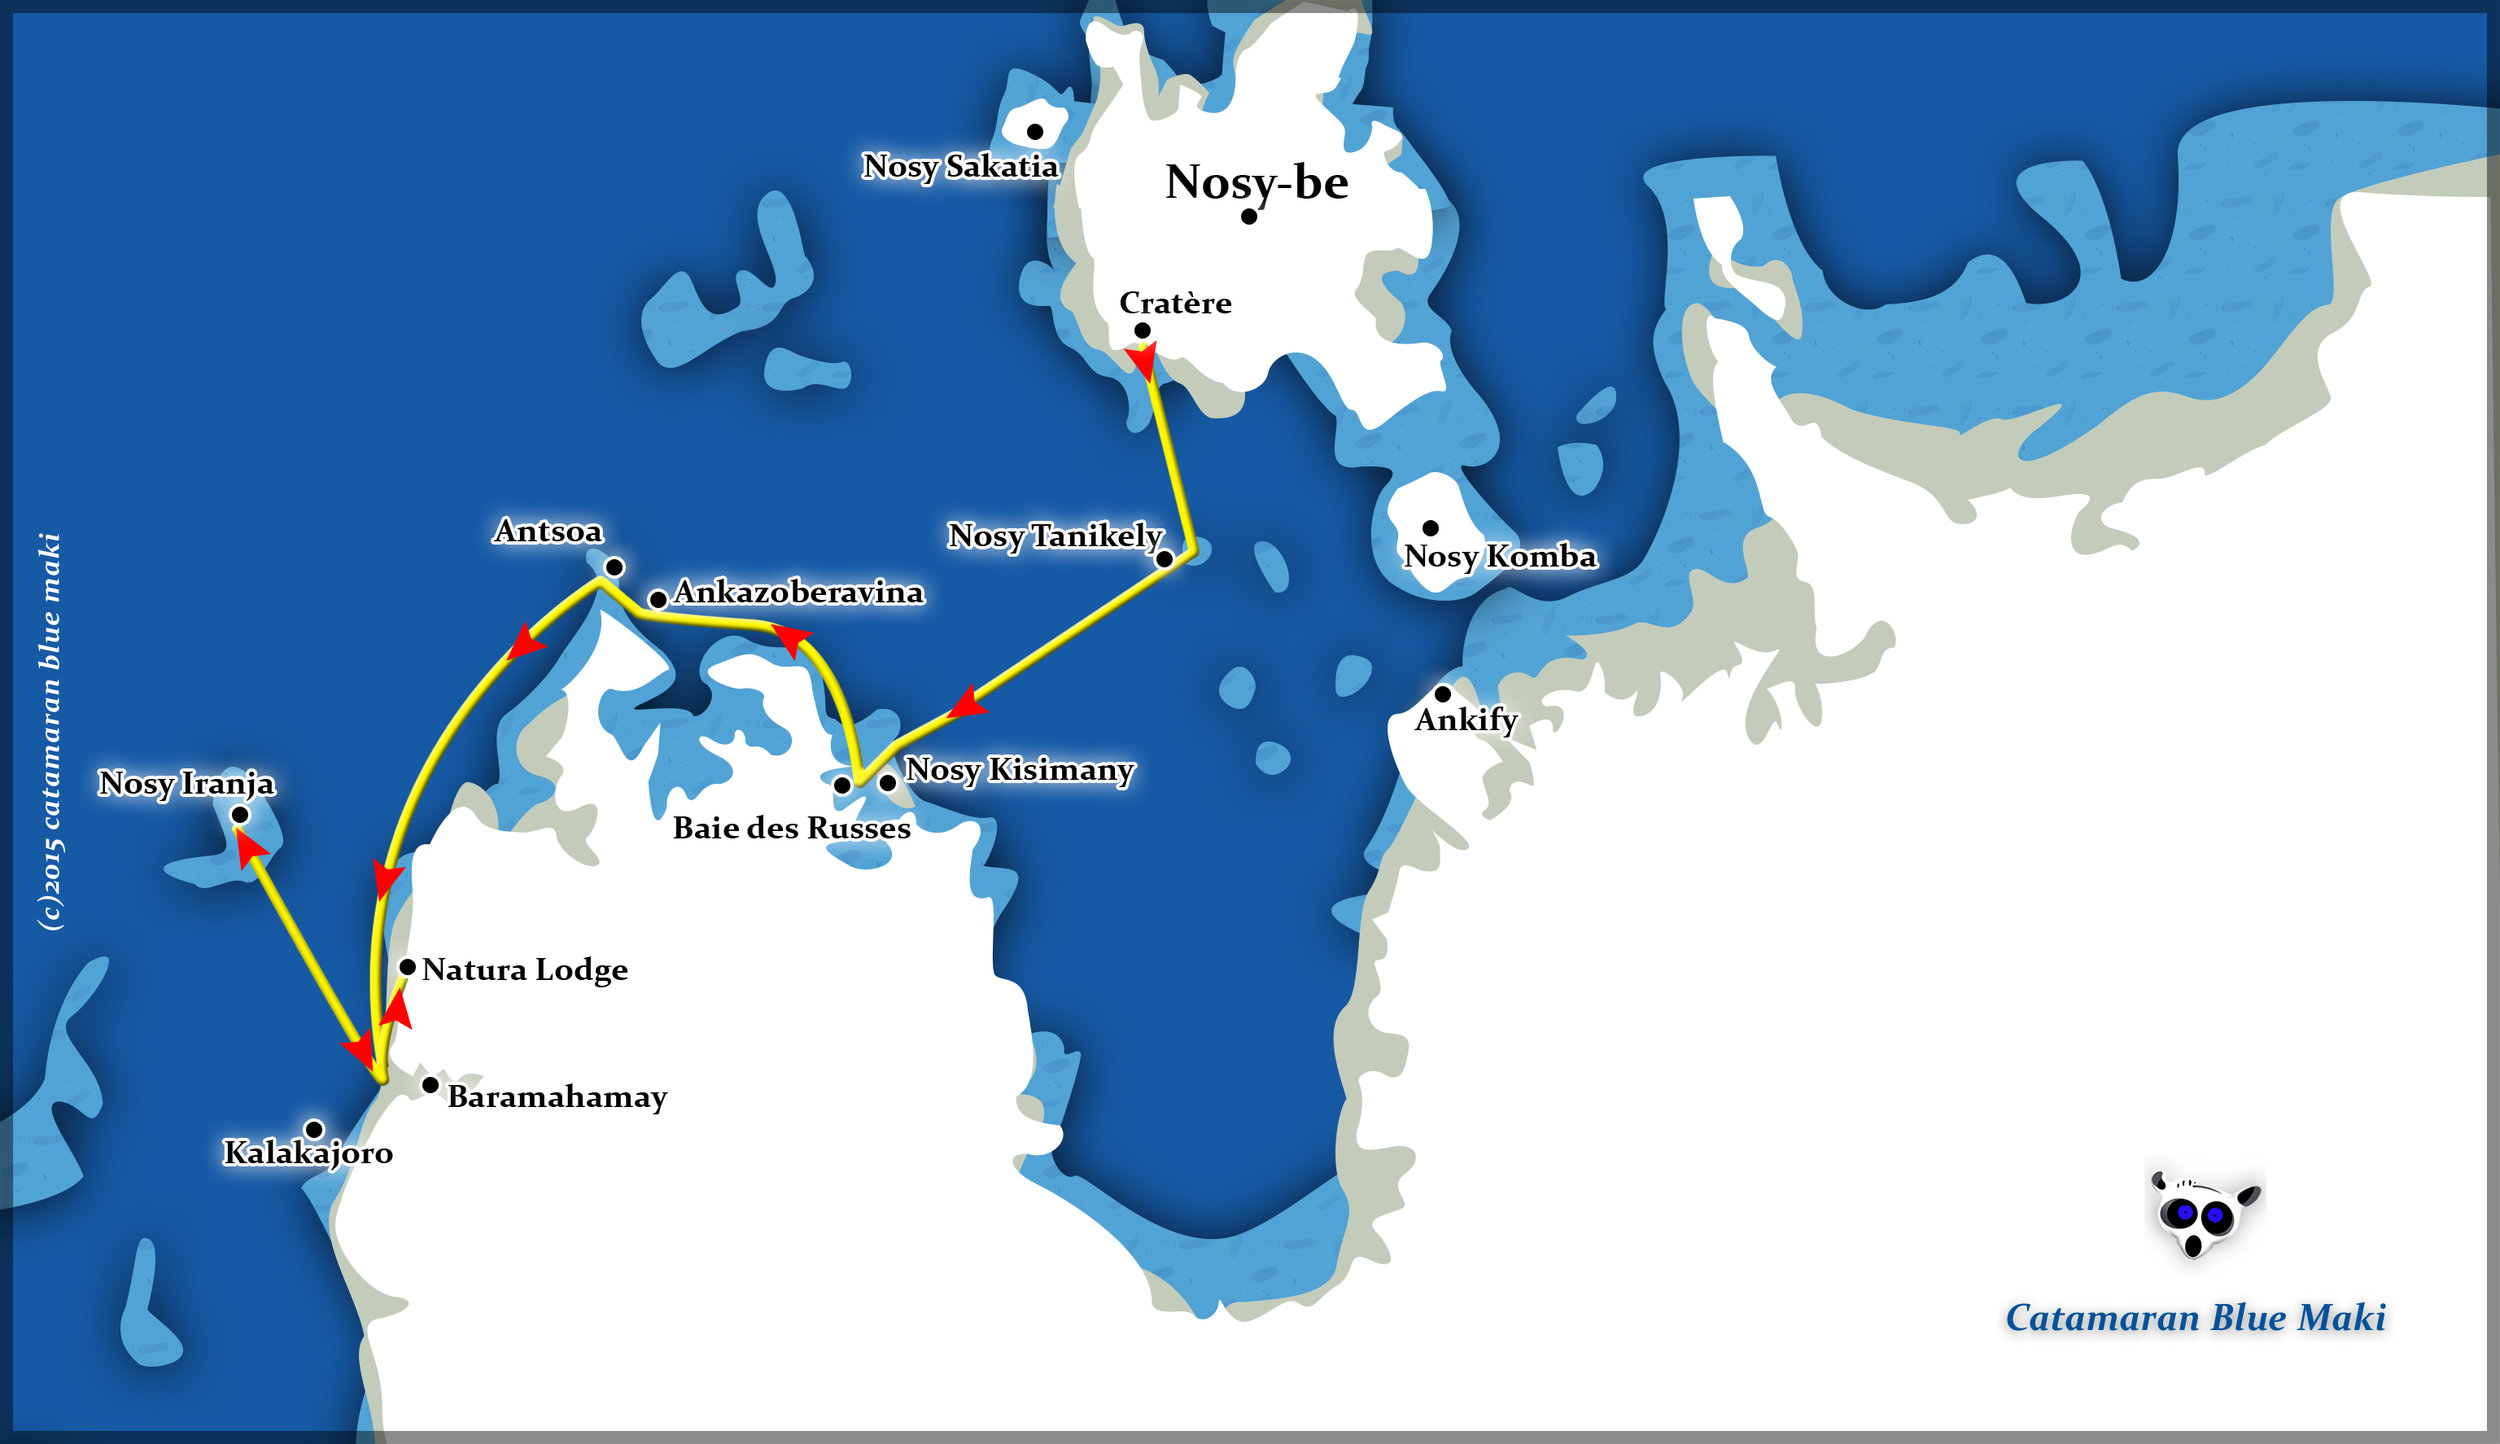 Routes of the Maki Cat